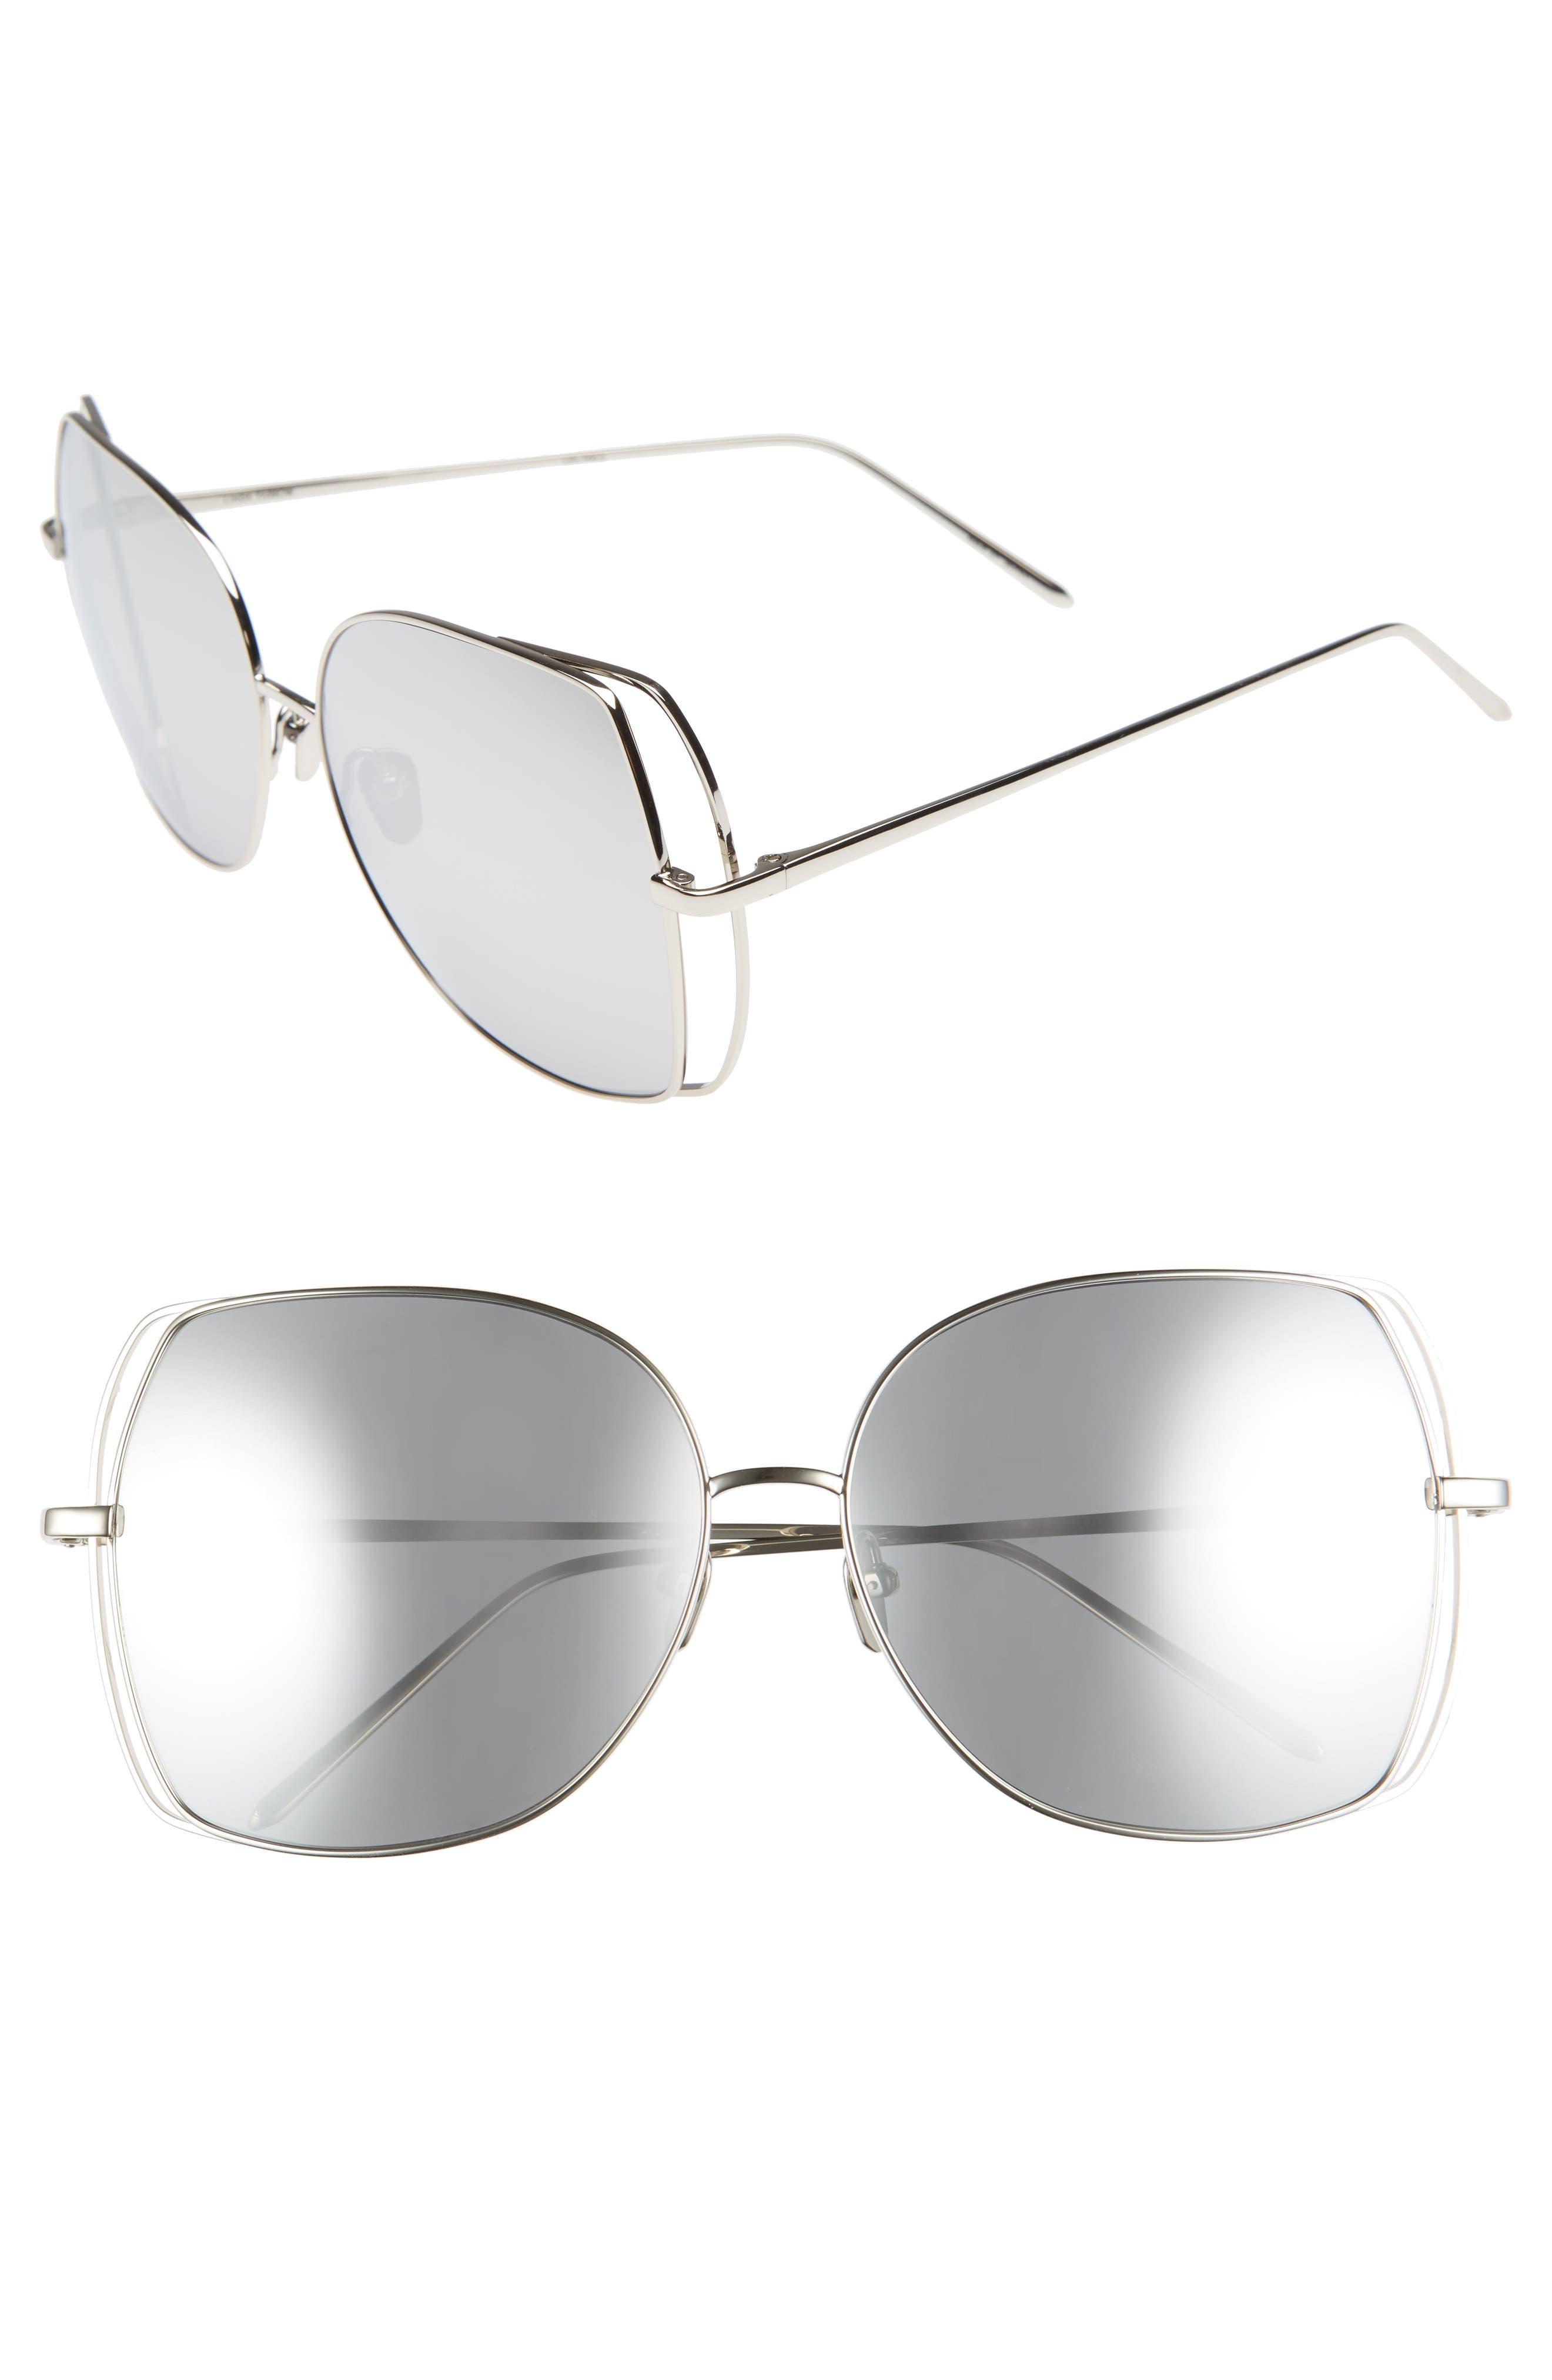 LINDA FARROW 61mm Mirrored 18 Karat White Gold Sunglasses